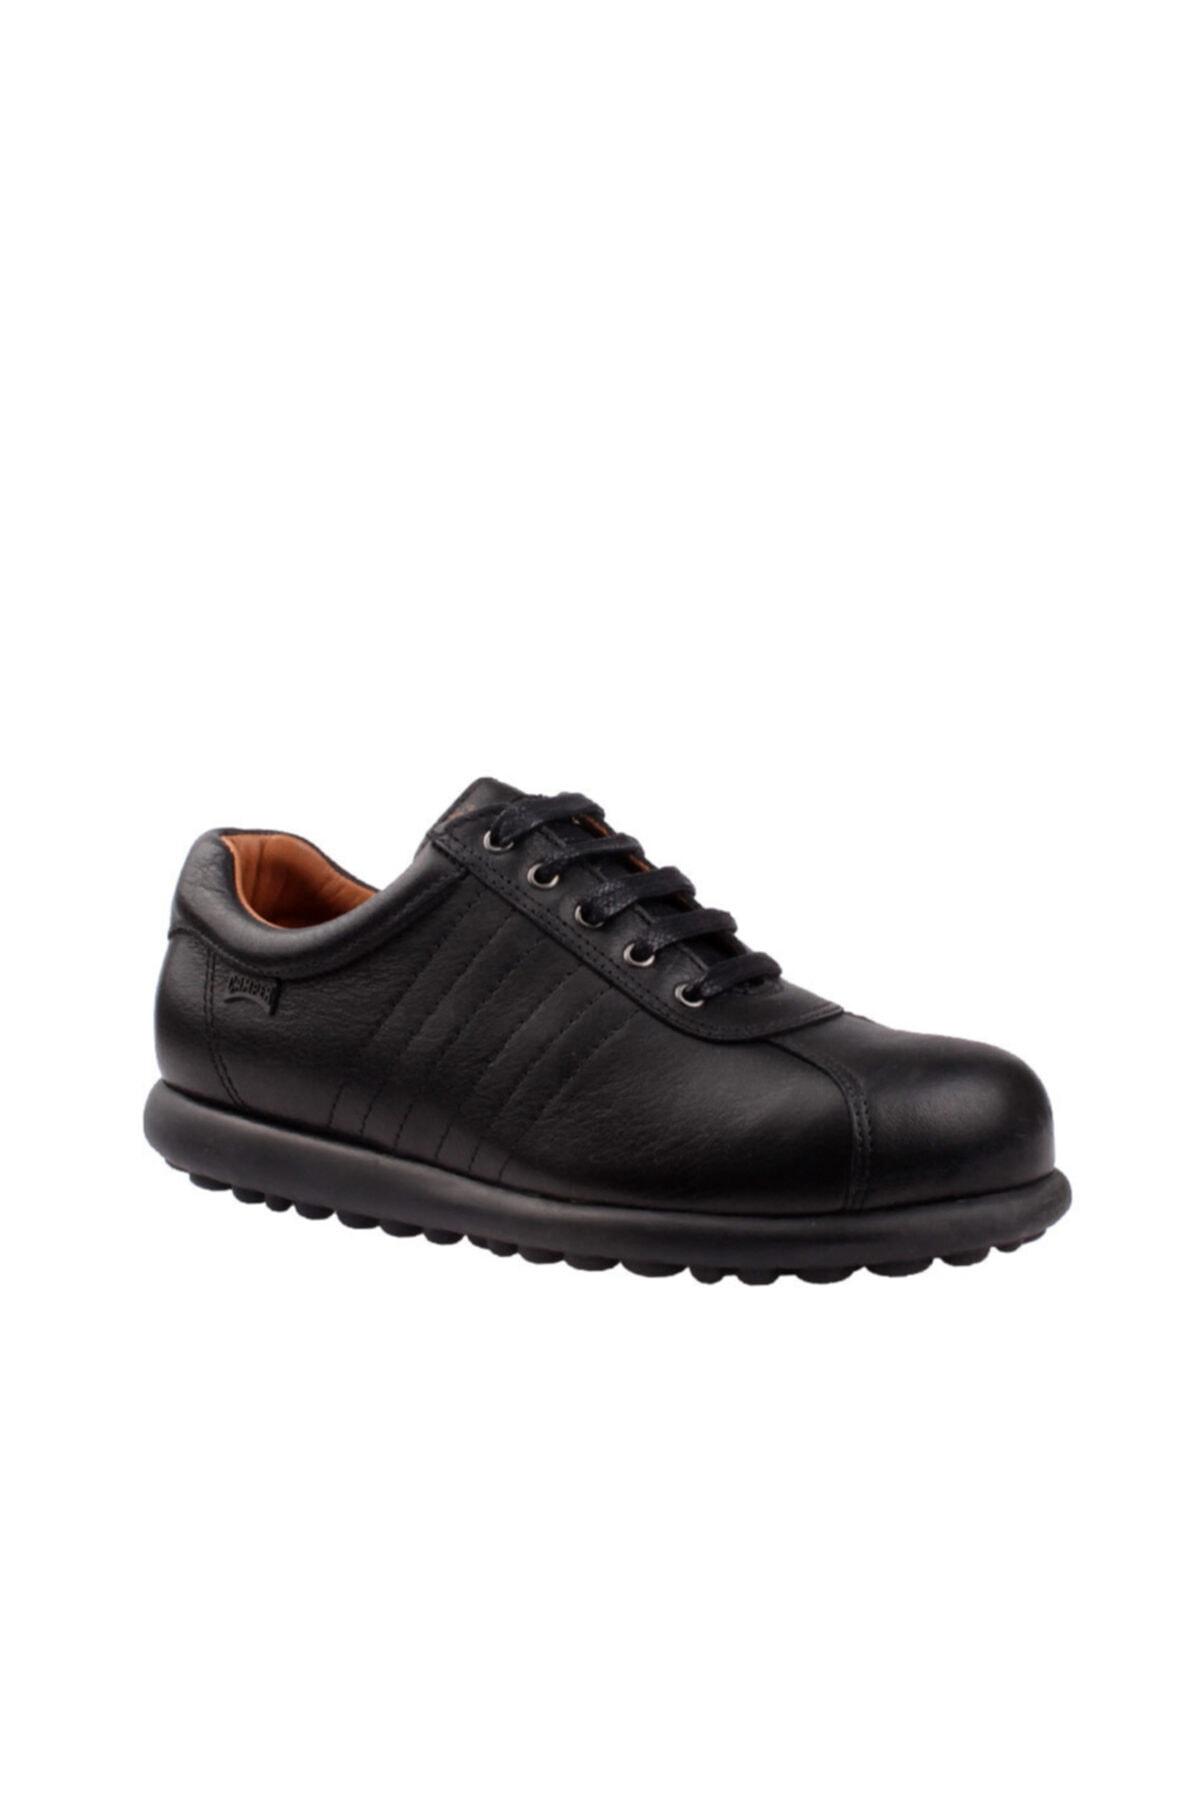 CAMPER Kadın Siyah Hakiki Deri Pelotas Ariel Sneaker 27205-233 1